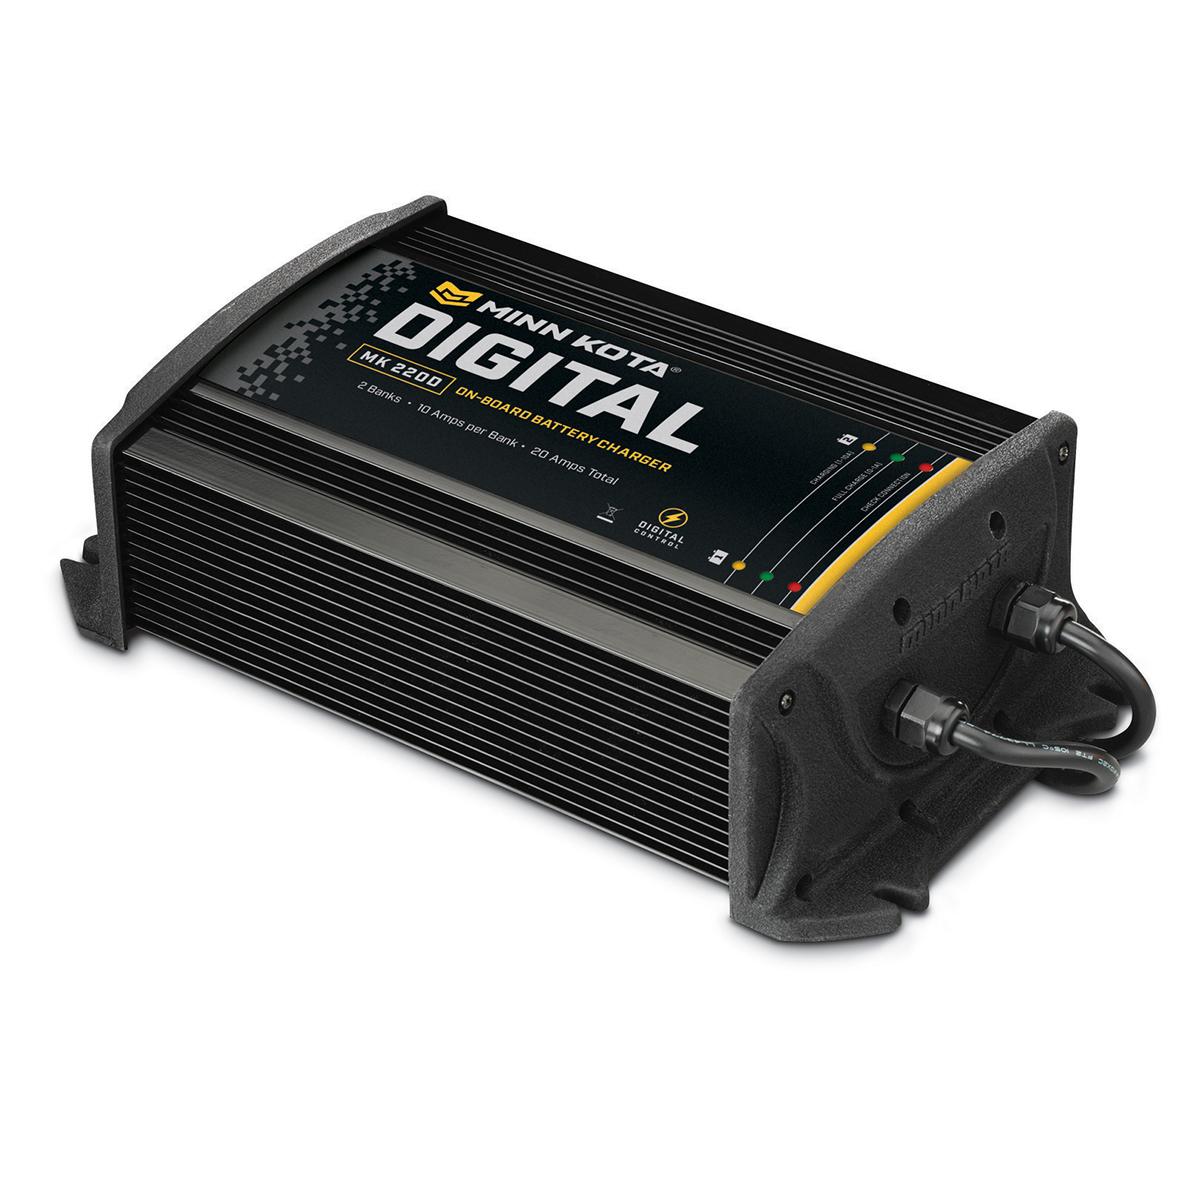 Minn Kota On-Board Digital Charger - 2 Banks, 10 Amps